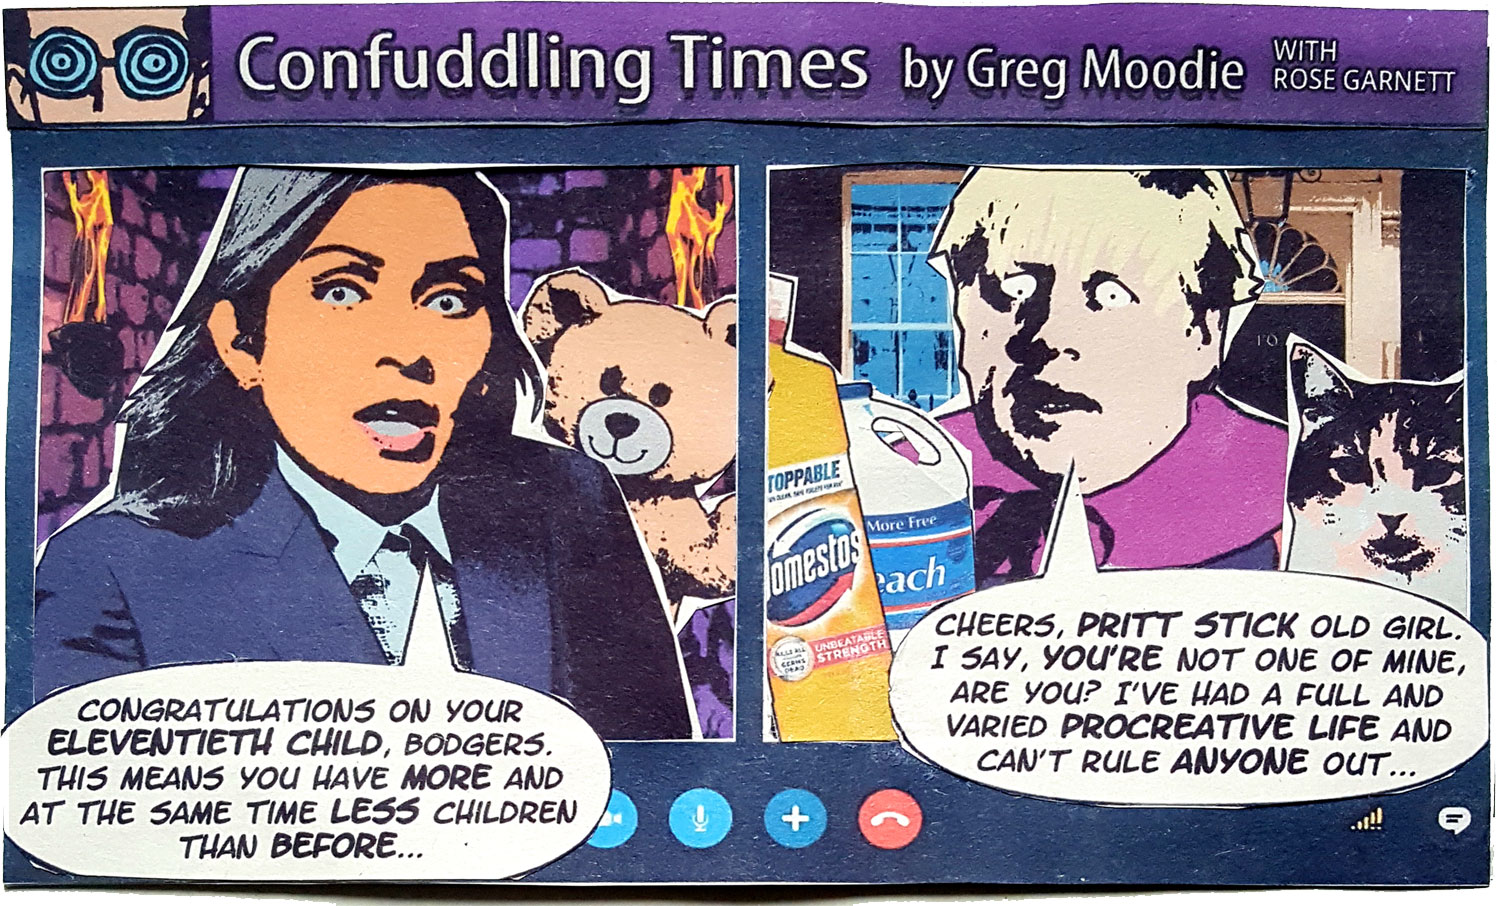 Confuddling Times